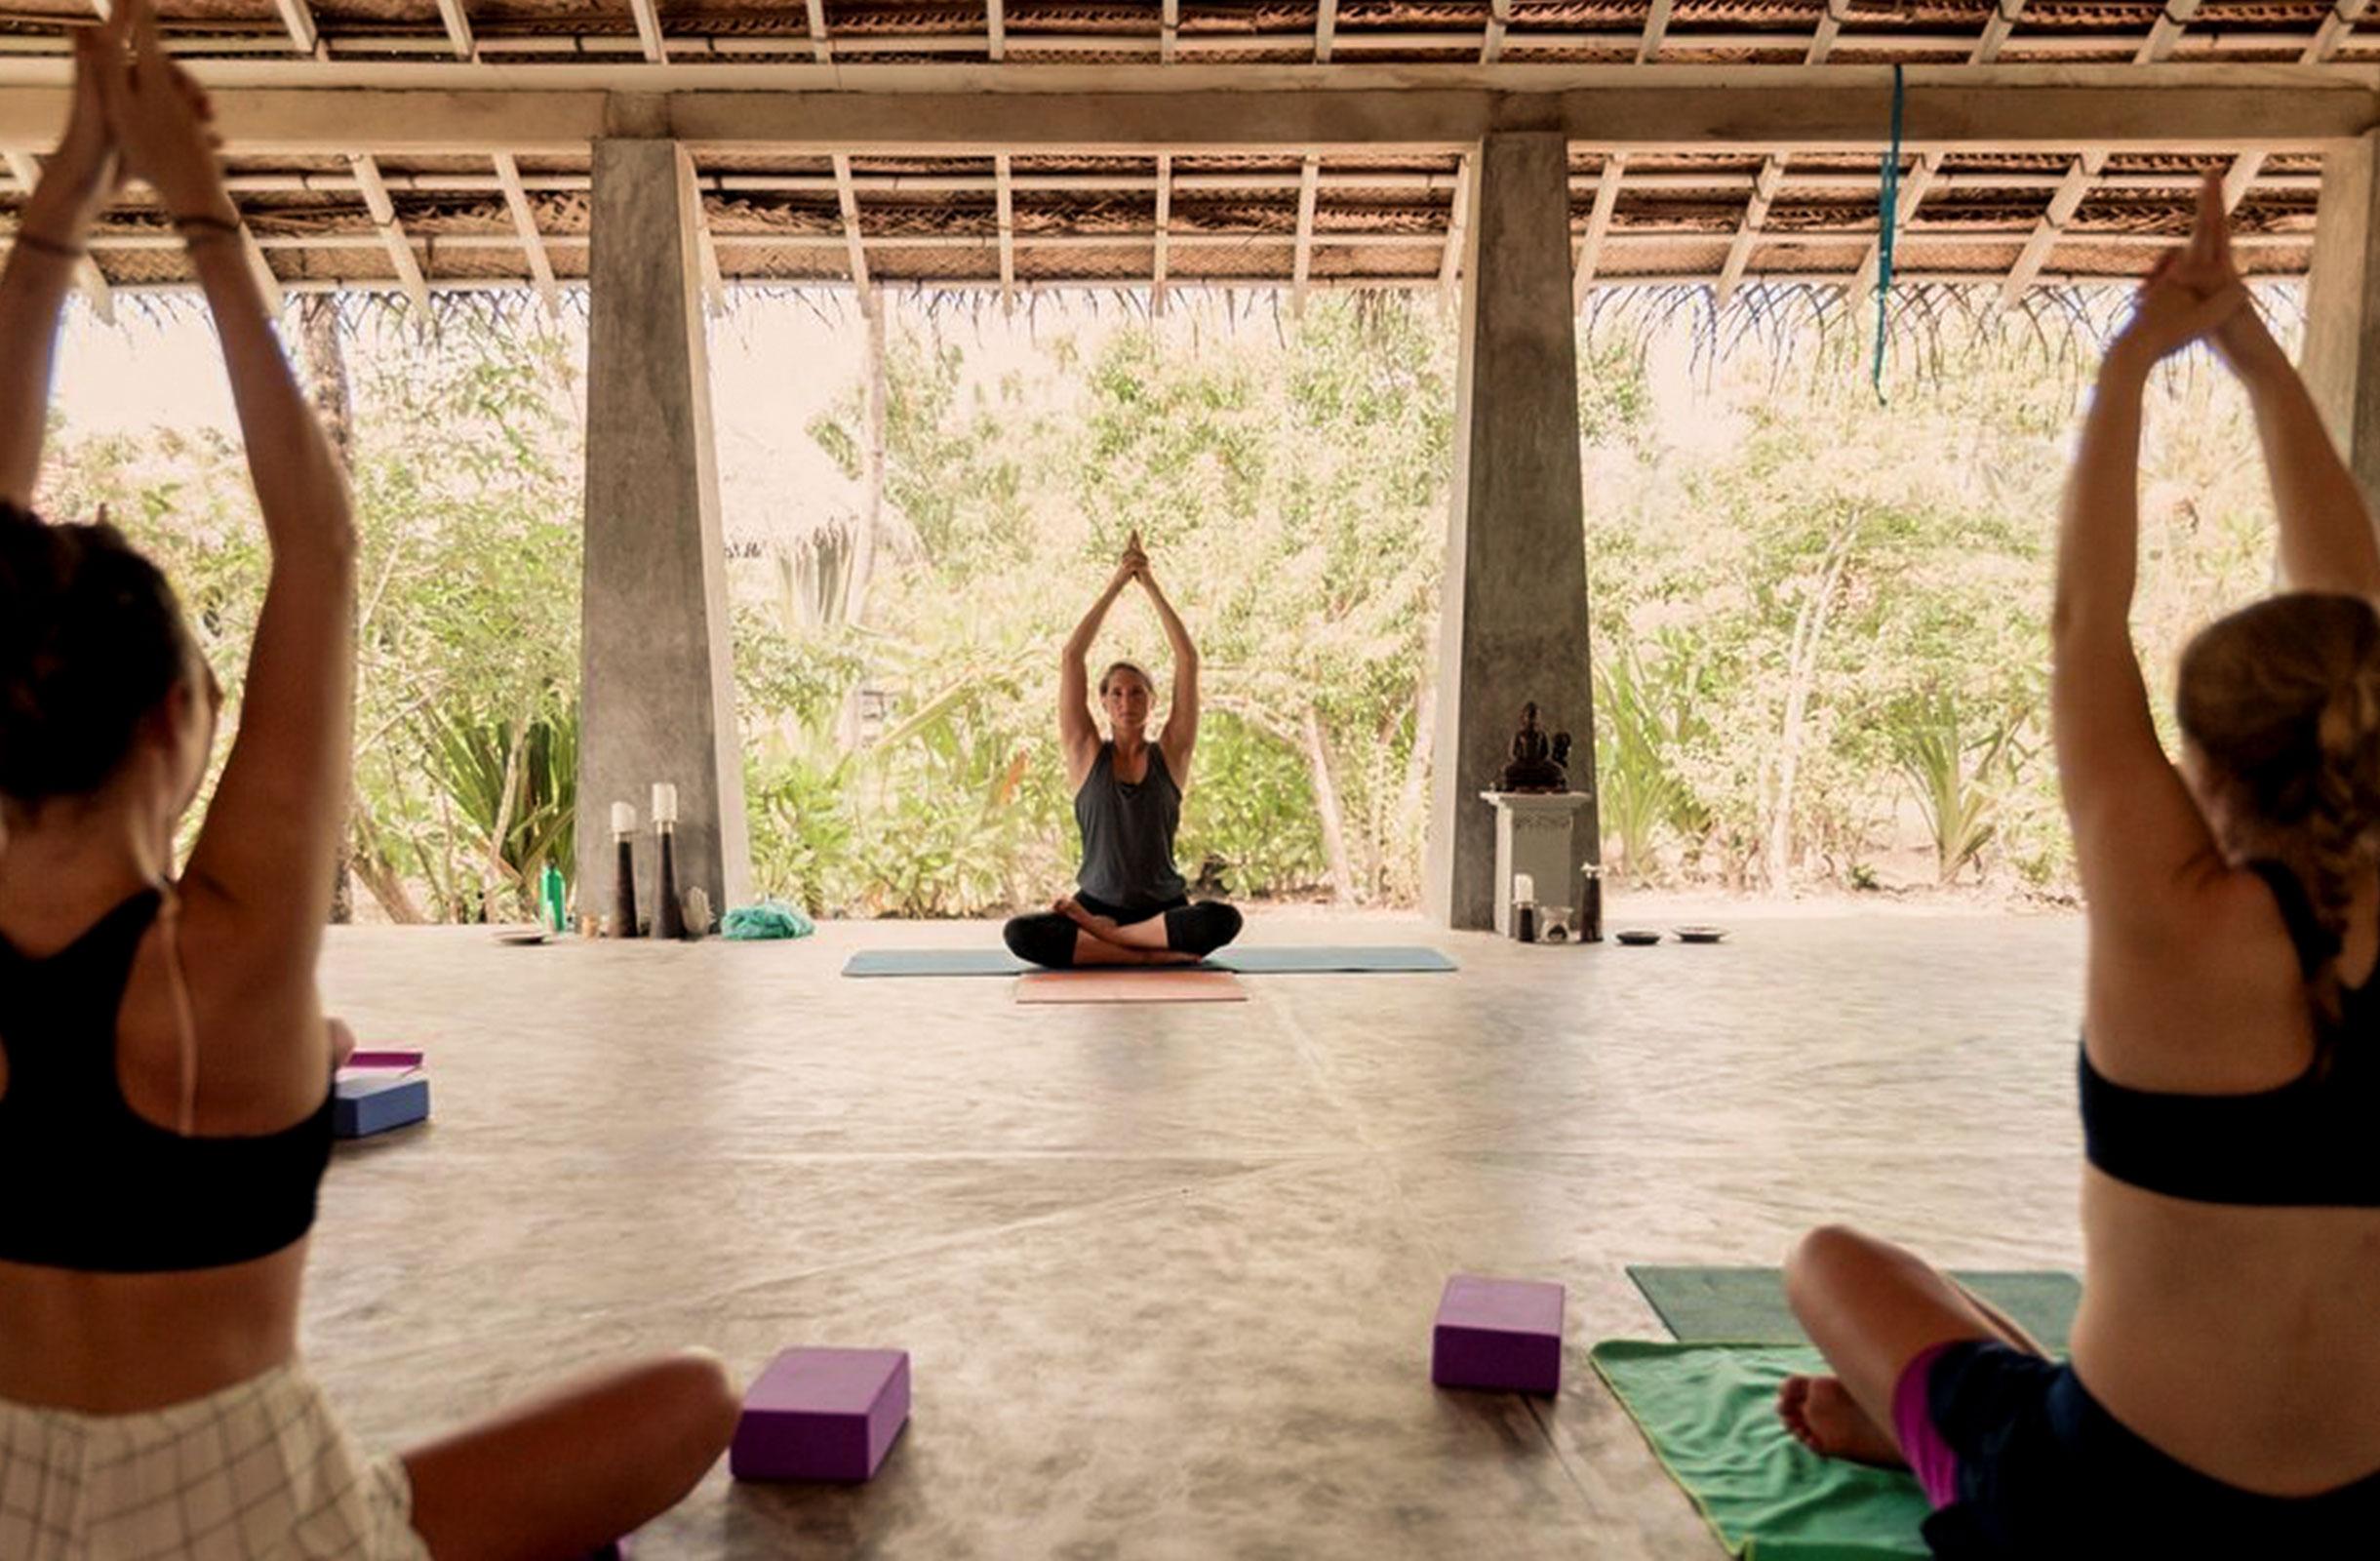 Soul_and_Sun_Yoga_Anke_Lenz_2440x1600_Stunden.jpg